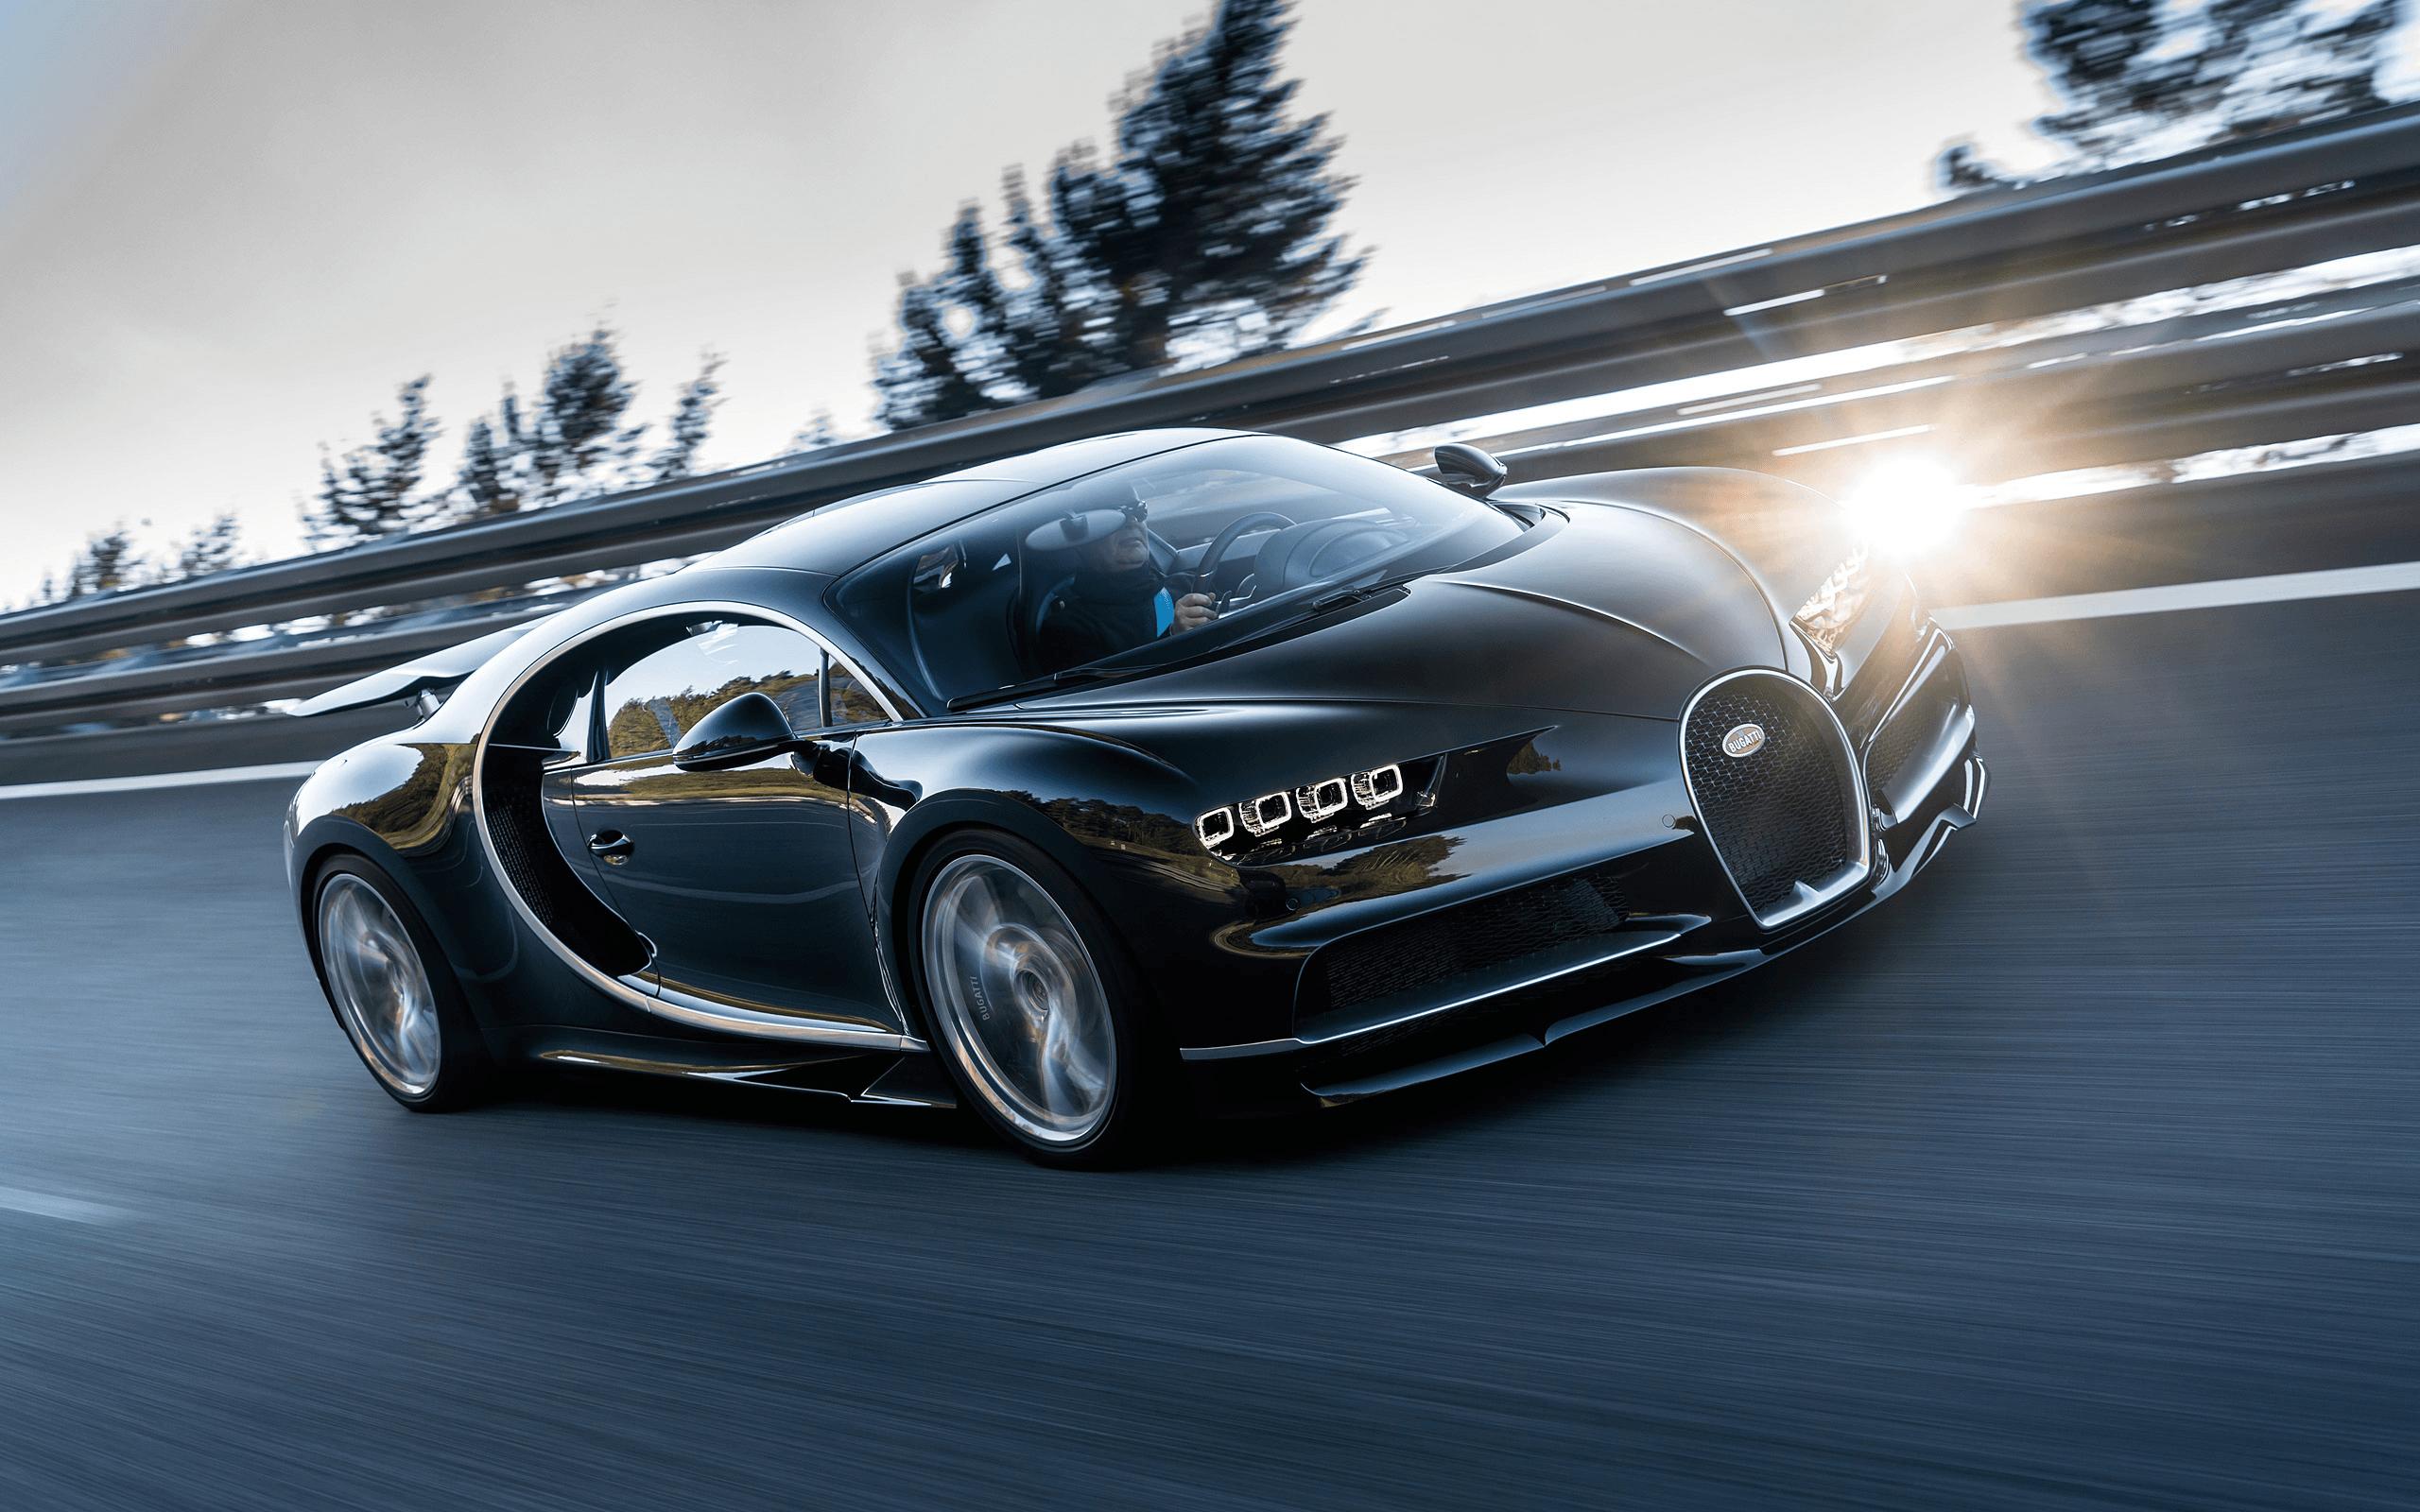 Bugatti Cars Wallpapers Wallpaper Cave